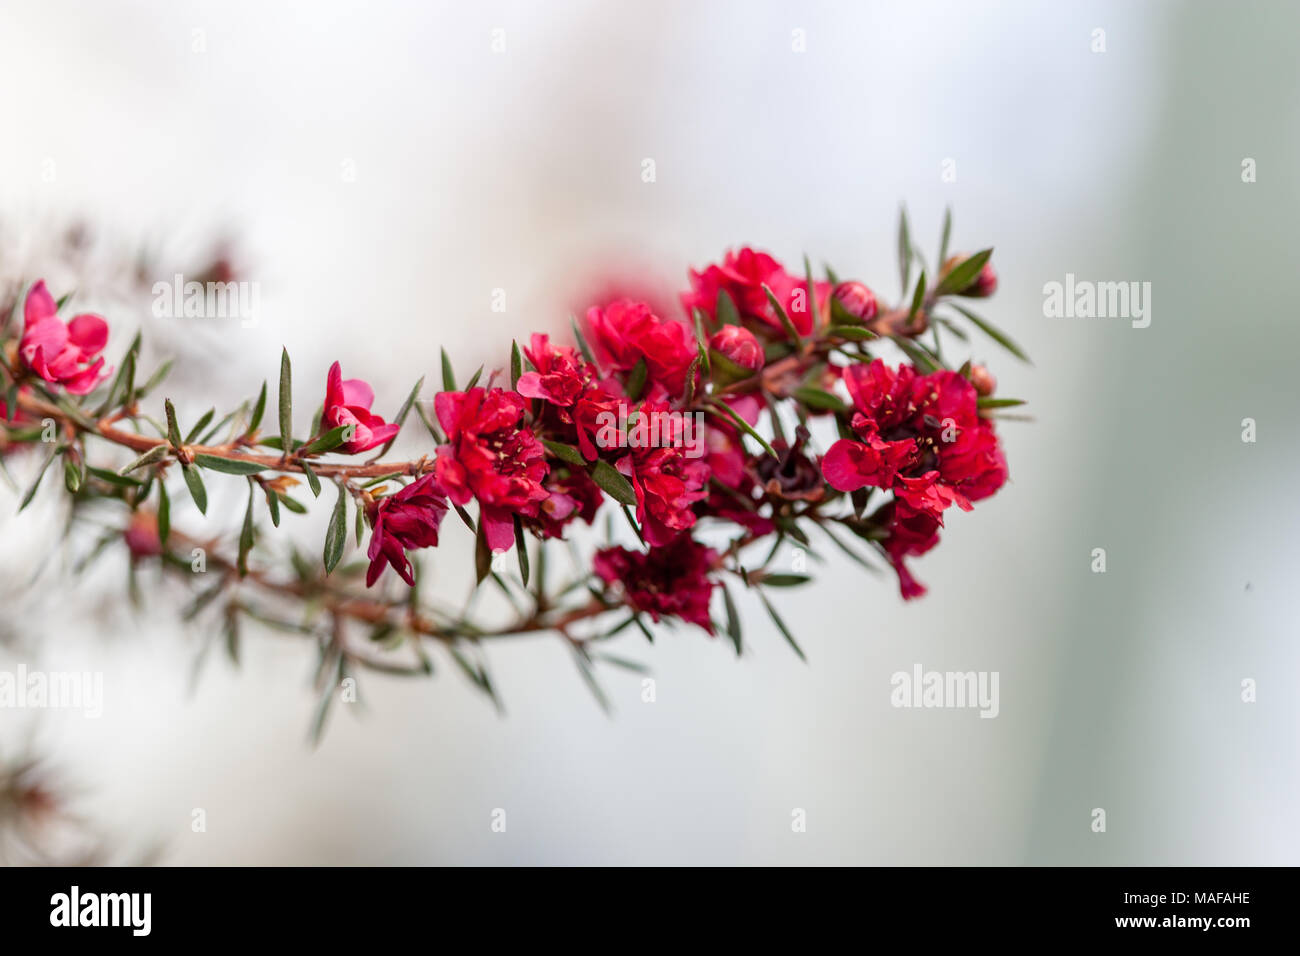 Manuka Myrte, Rosenmyrten (Leptospermum scoparium) Stockbild